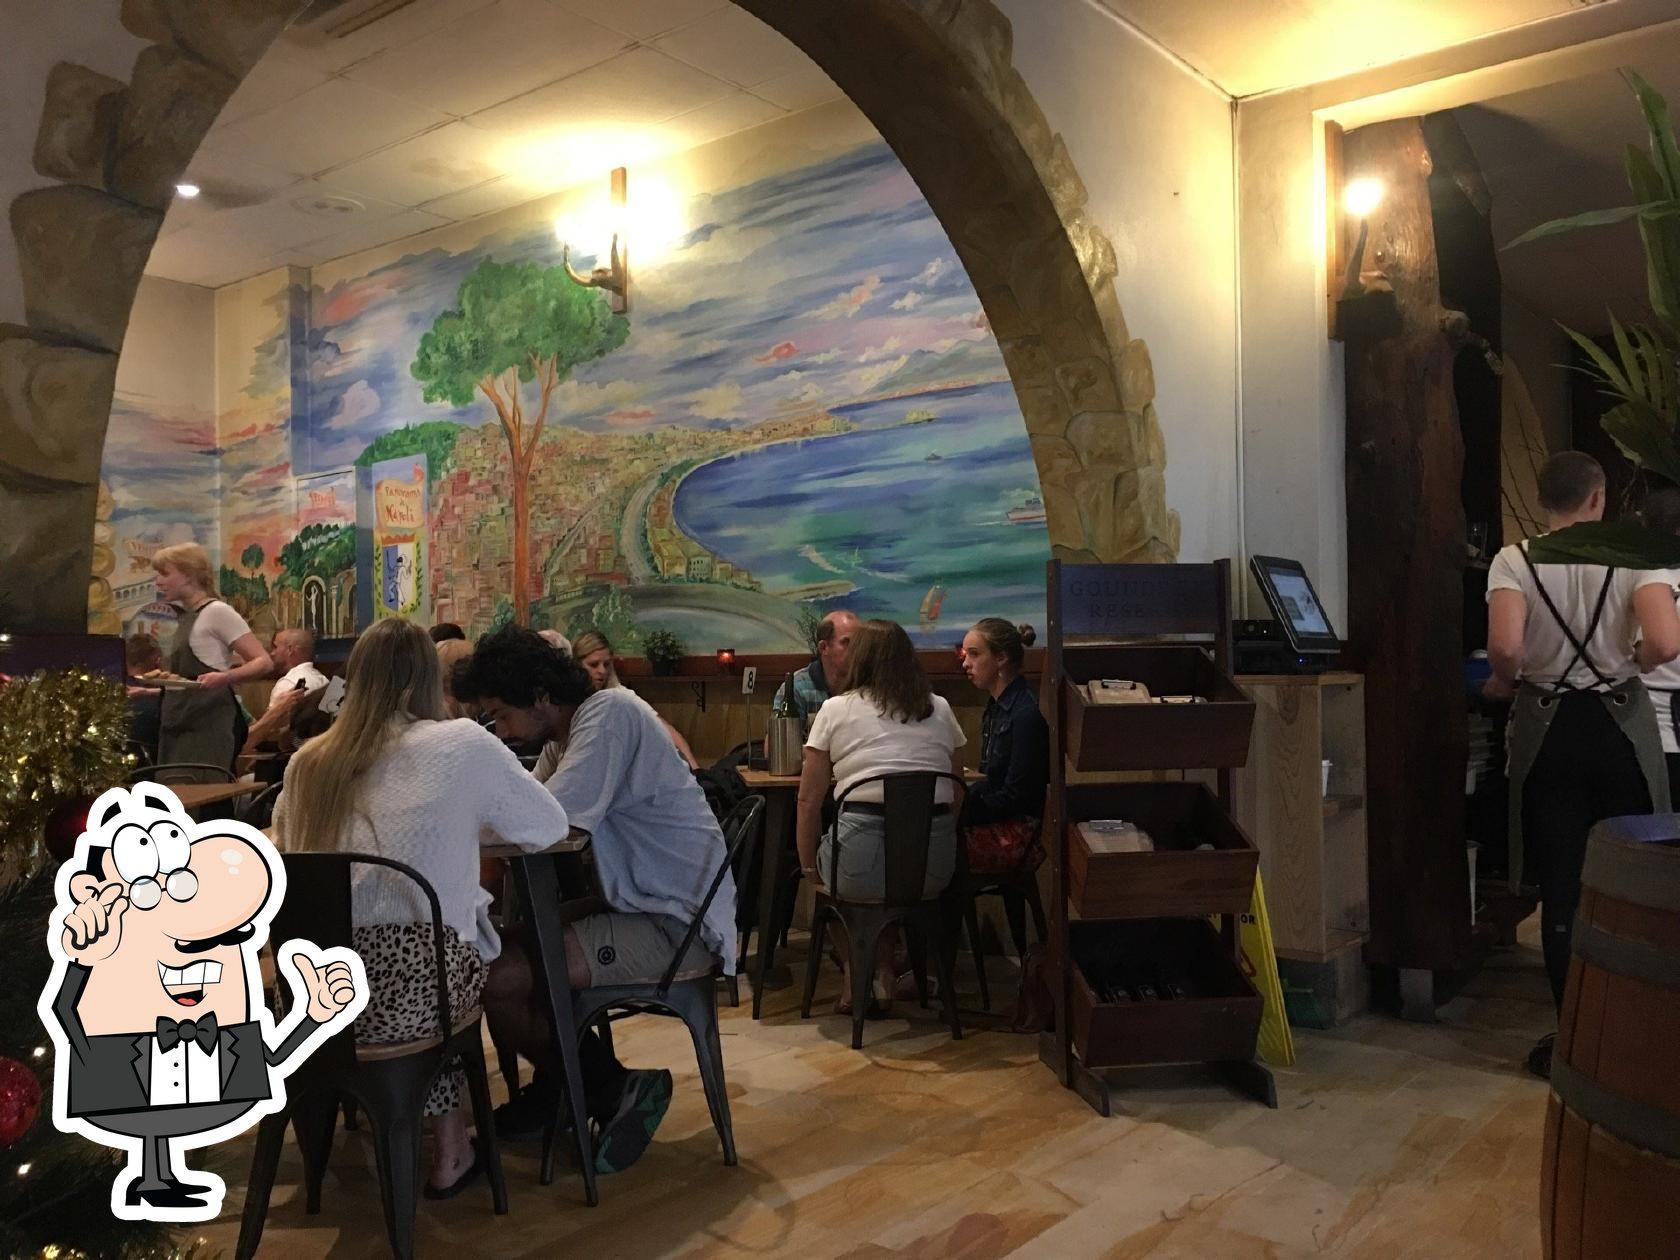 Посмотрите на внутренний интерьер Ruocco's Pizzeria e Ristorante